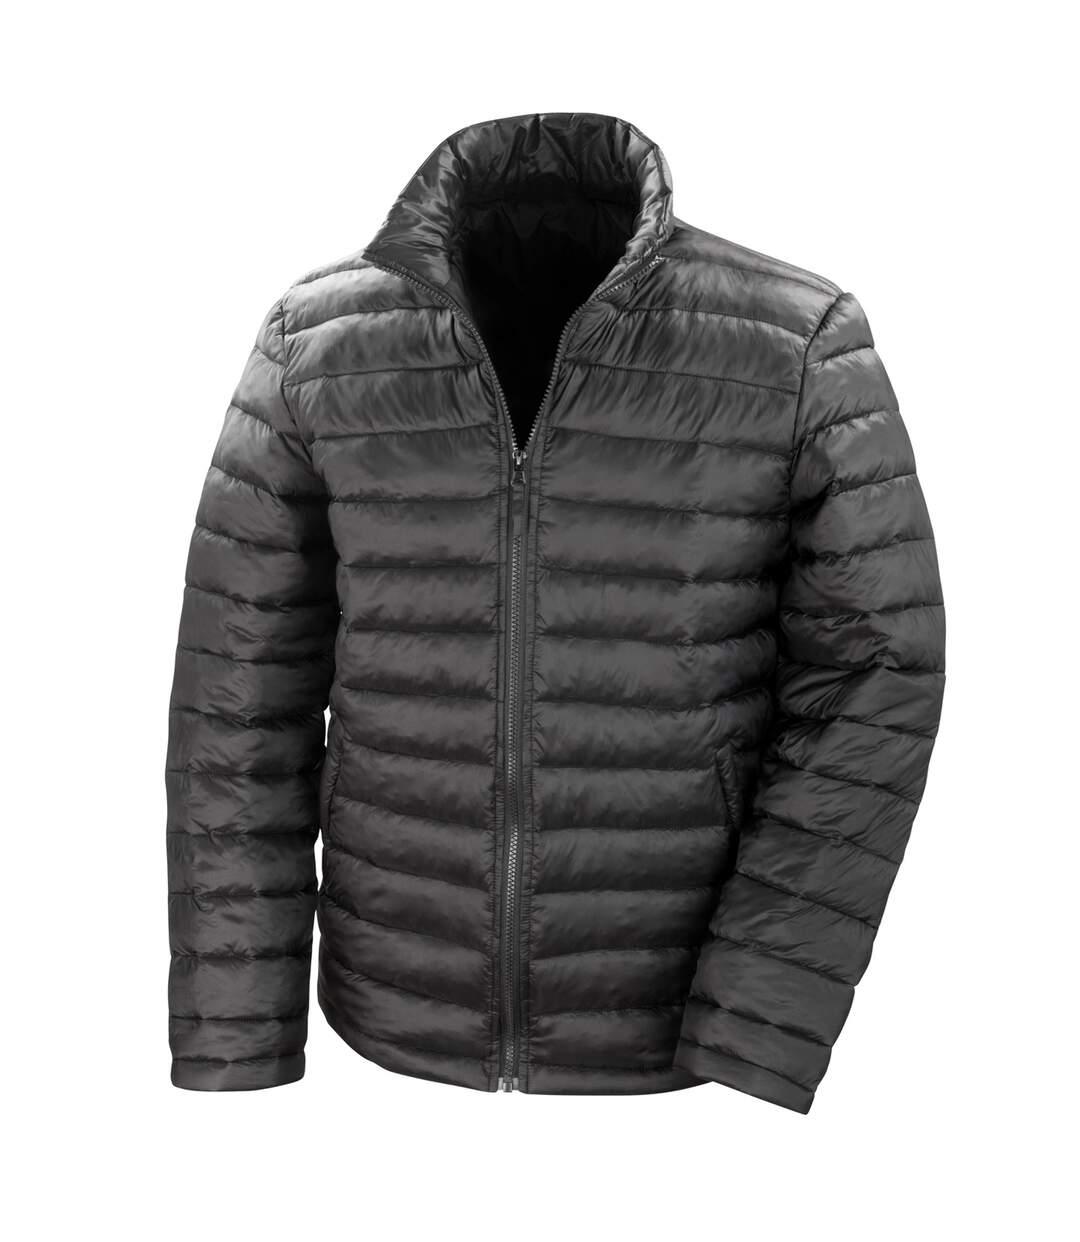 Result Mens Ice Bird Padded Winter Jacket (Water Repellent & Windproof) (Black) - UTBC2048